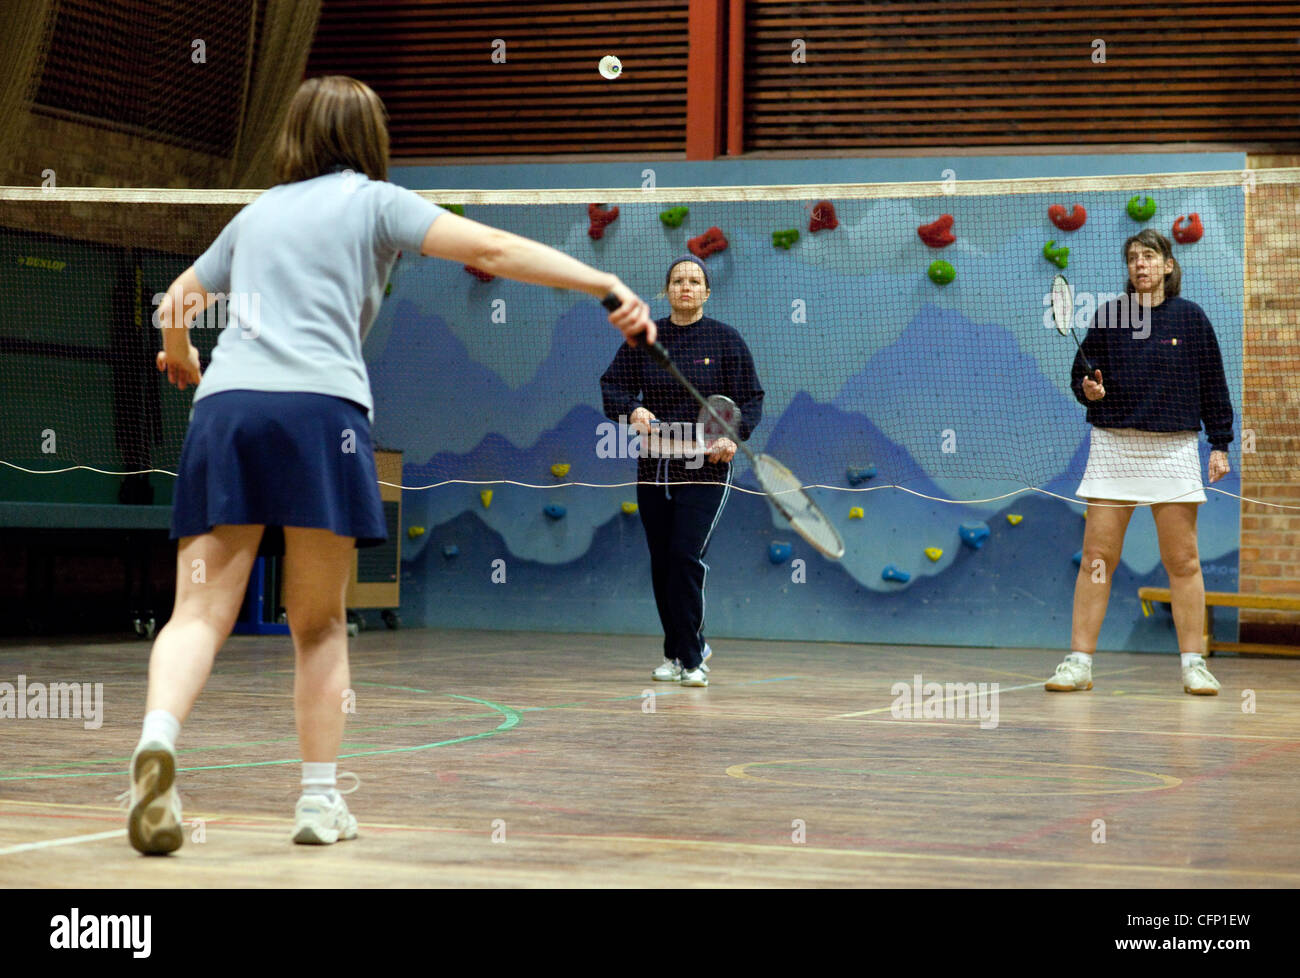 Three women playing a game of badminton, Newmarket Suffolk UK - Stock Image